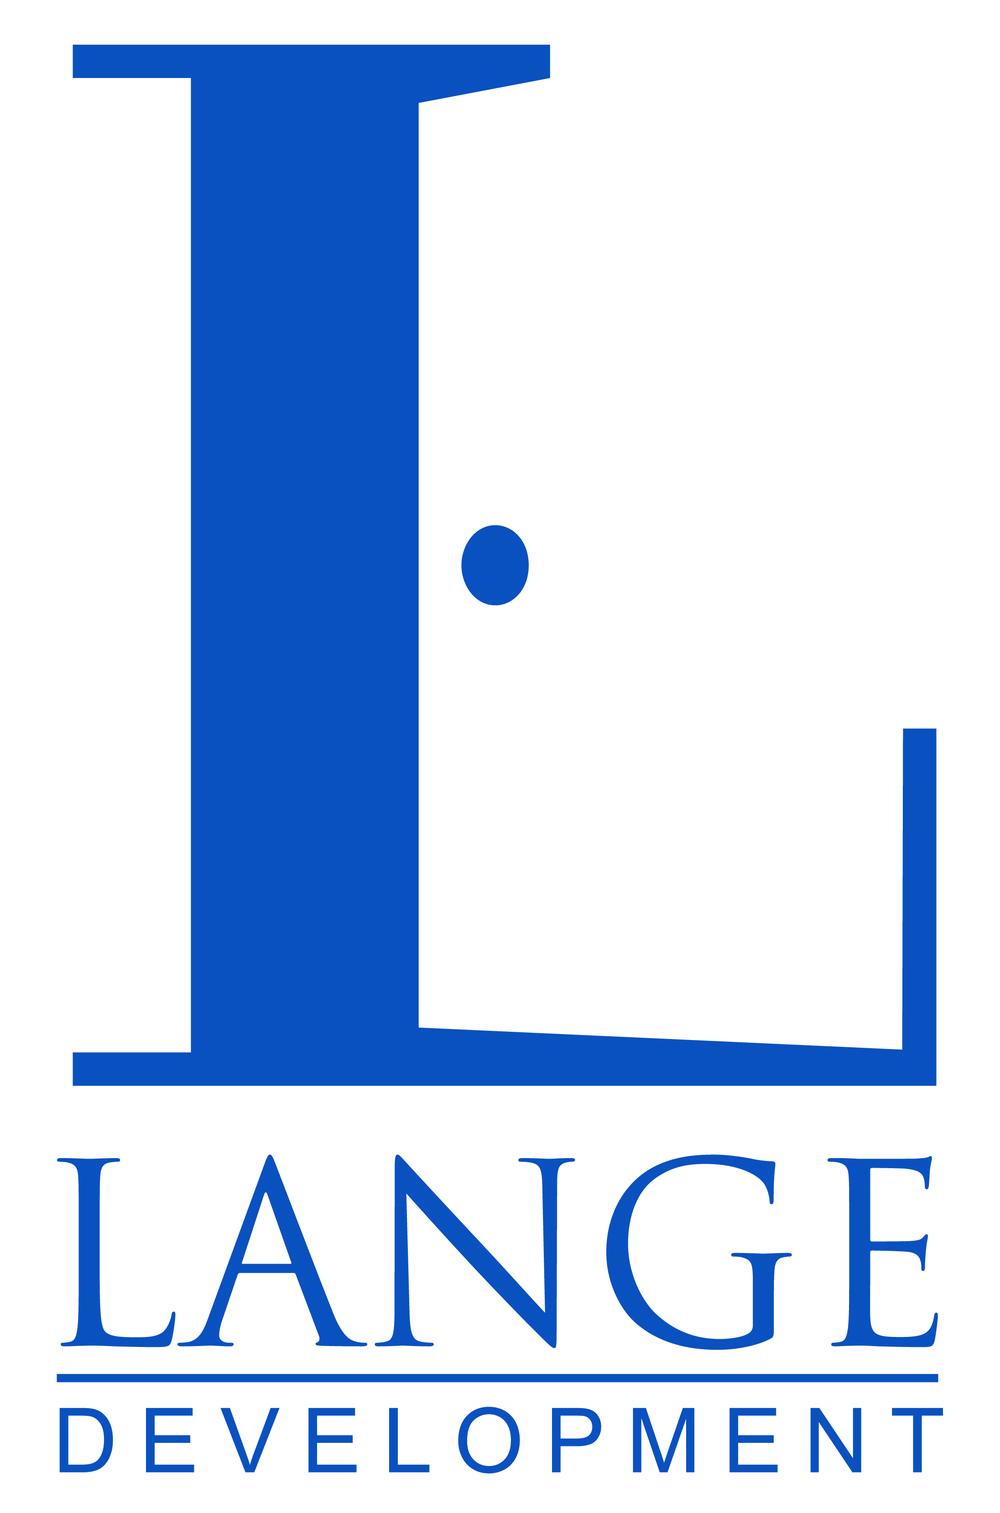 Lange Development Print-01.jpg